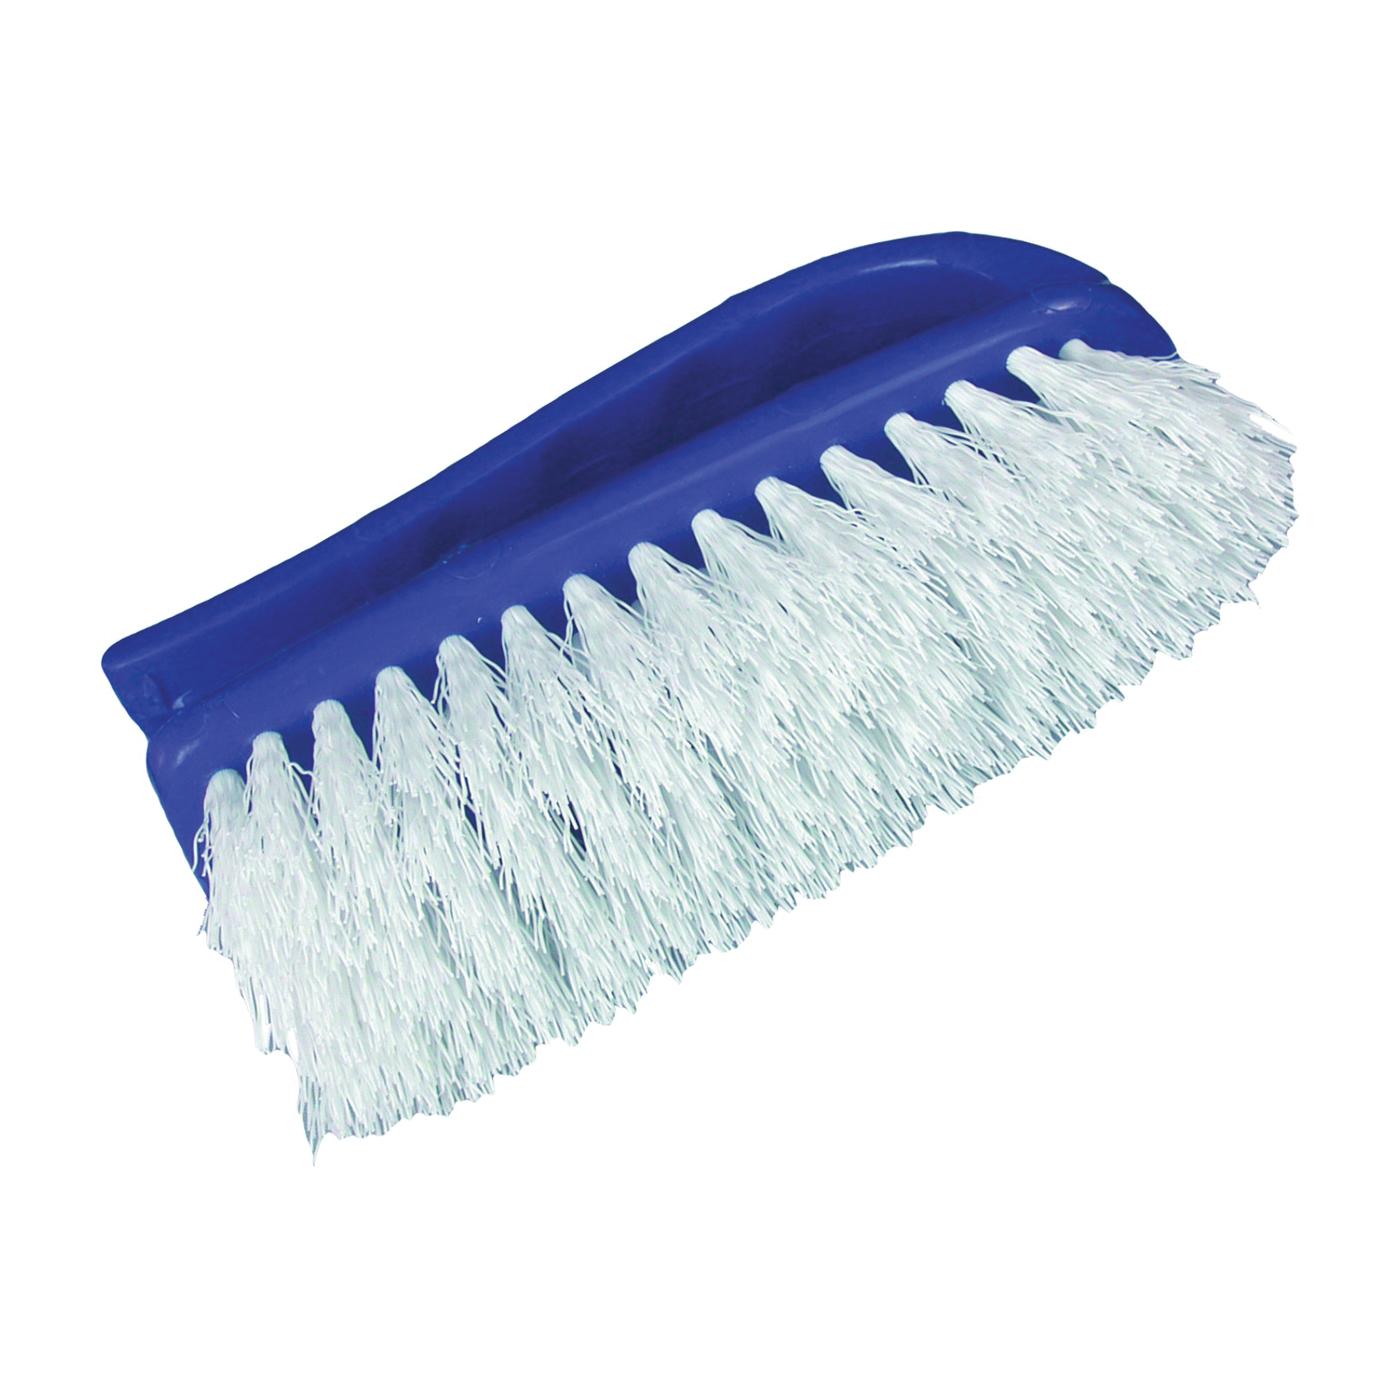 Picture of BIRDWELL 474-48 Power Scrub Brush, 1-1/8 in L Trim